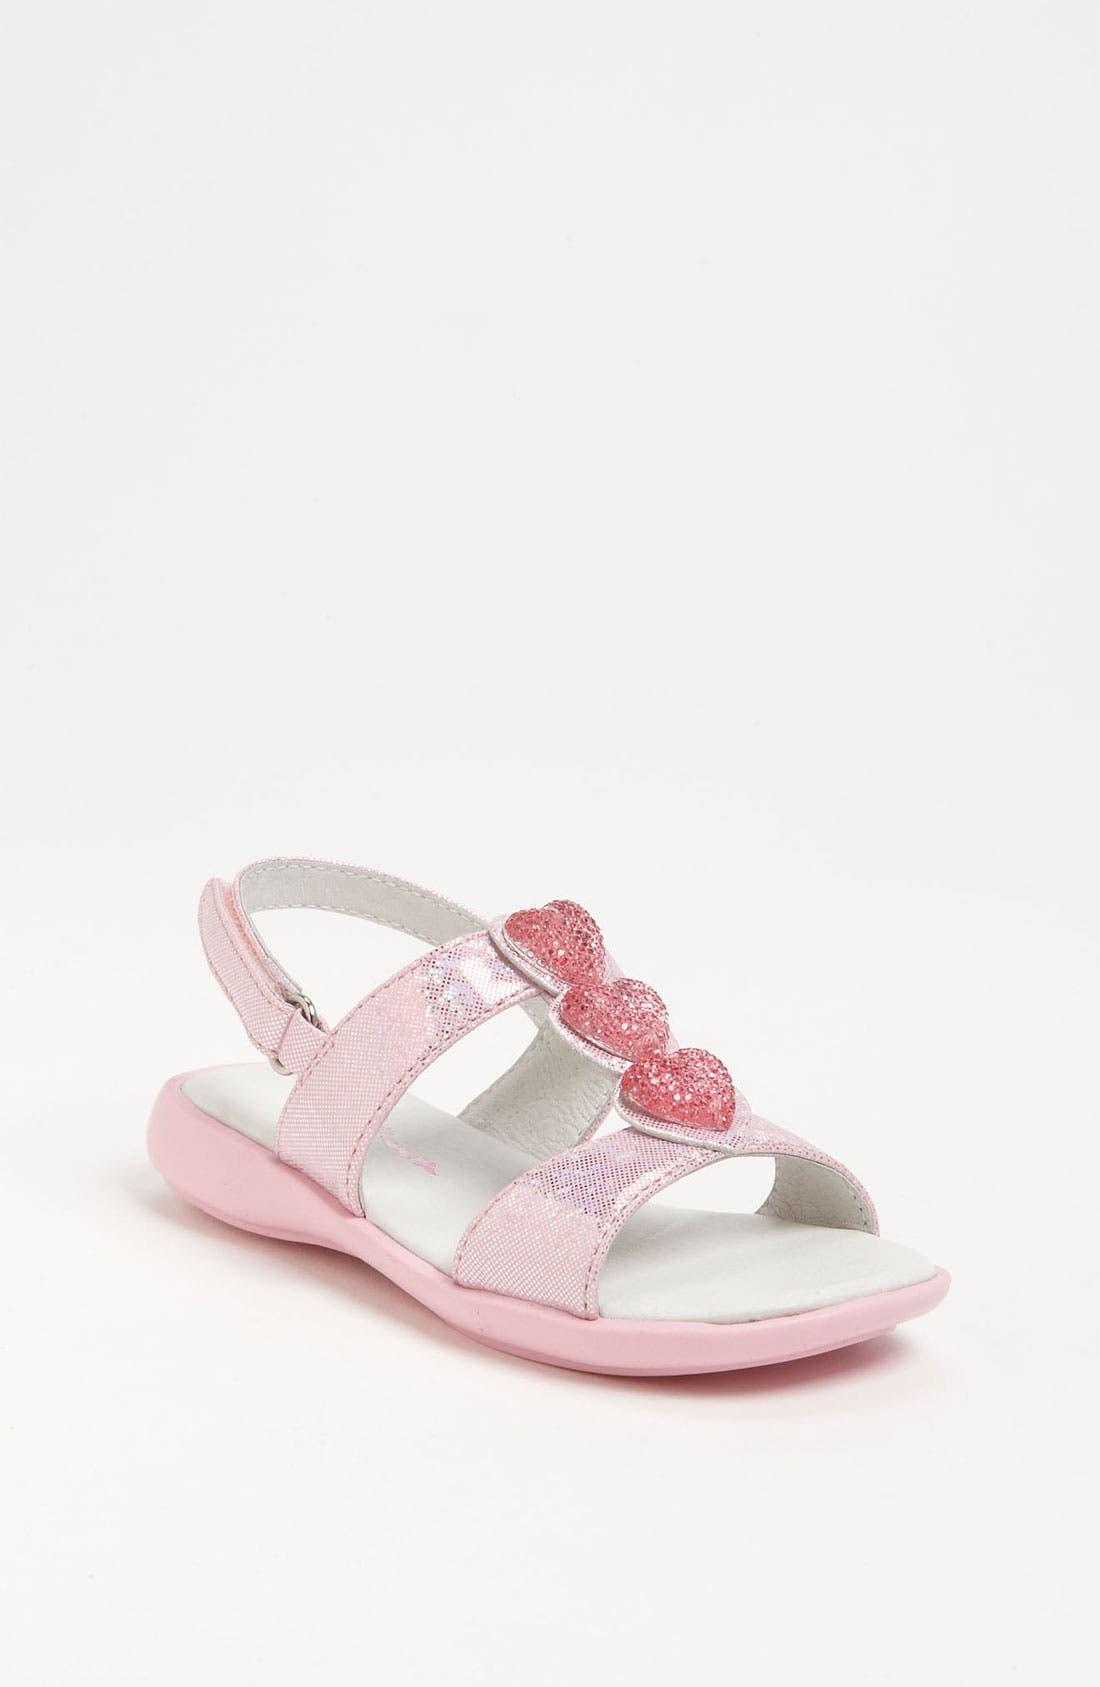 Alternate Image 1 Selected - Nina 'Clarina' Heart Sandal (Walker & Toddler)